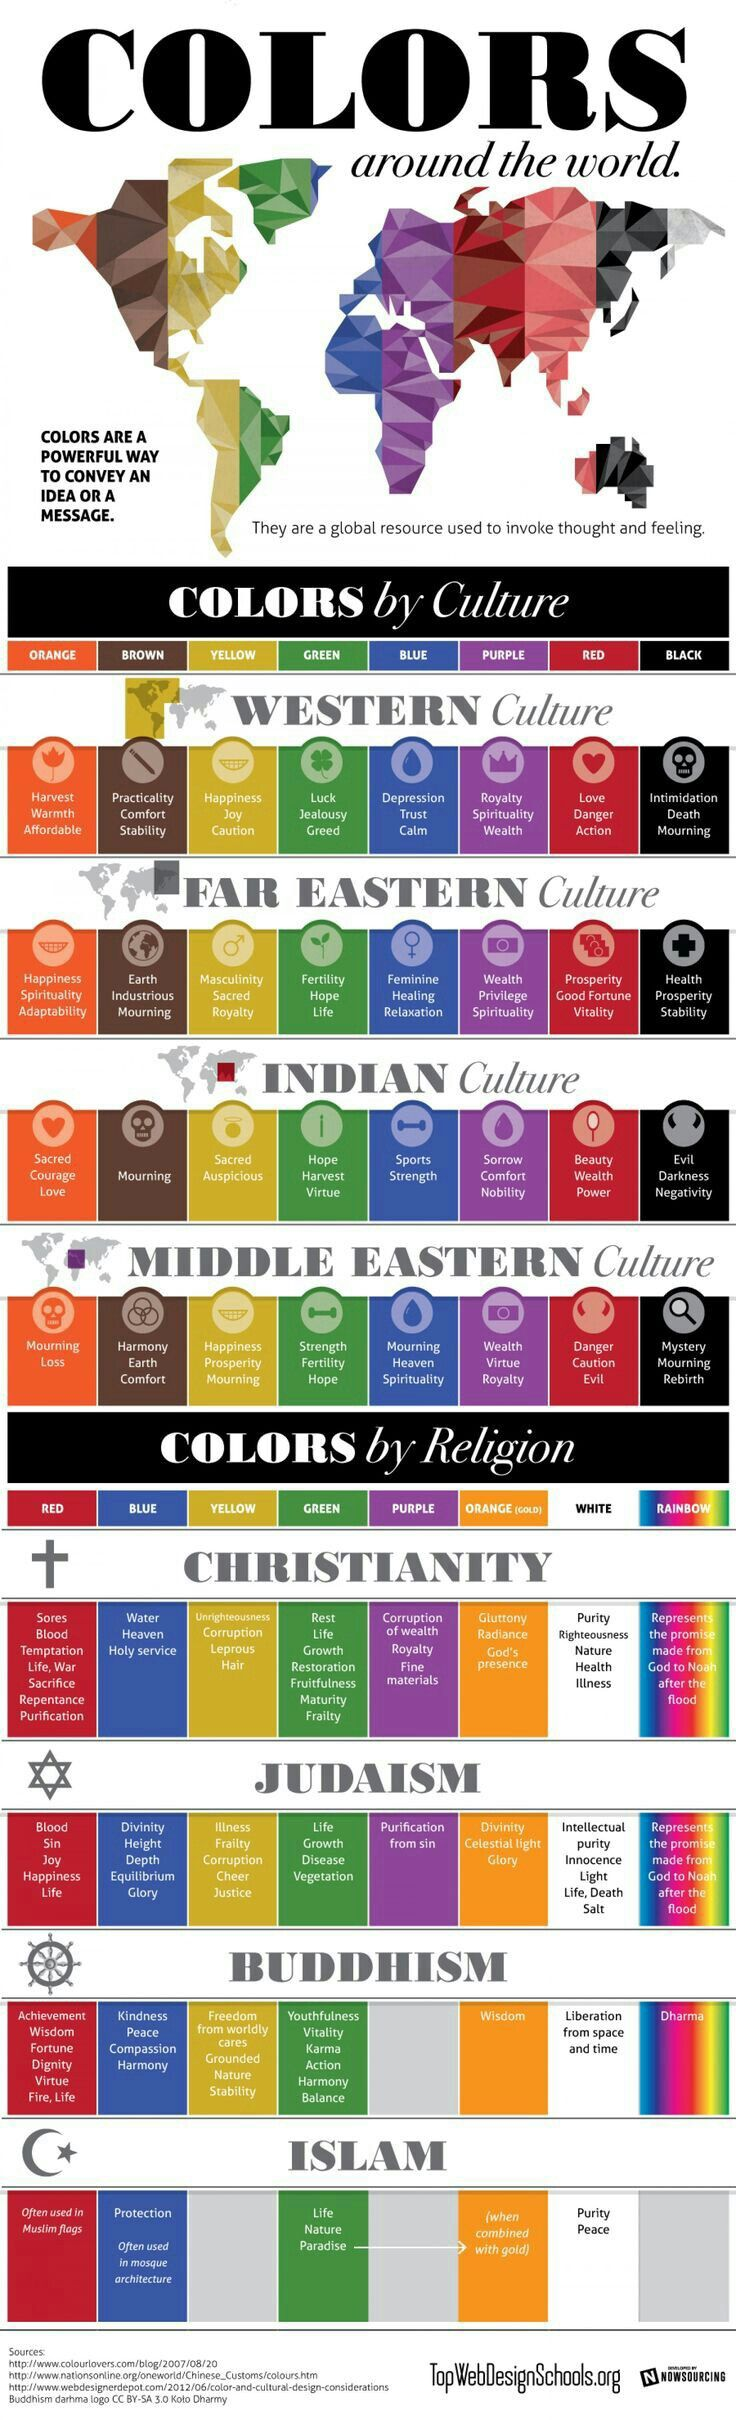 Colors Around The World